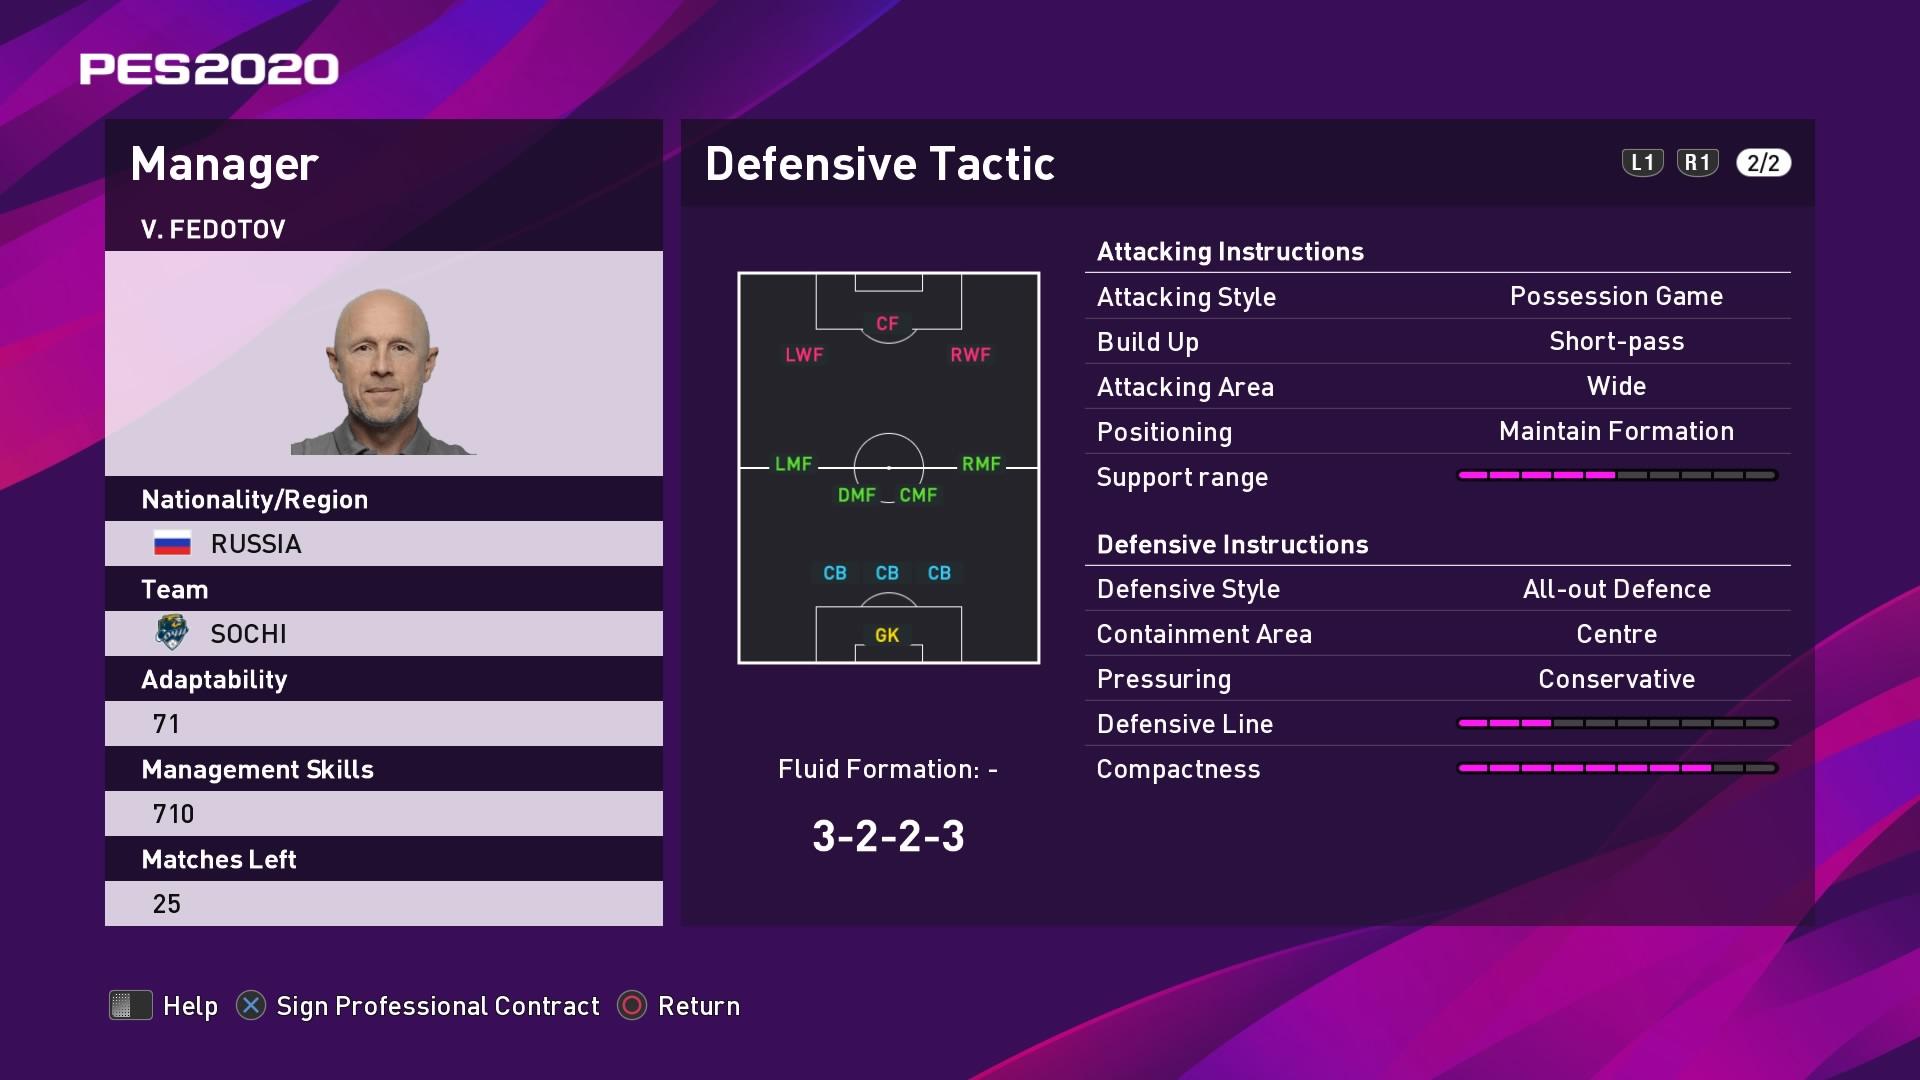 V. Fedotov (Vladimir Fedotov) Defensive Tactic in PES 2020 myClub